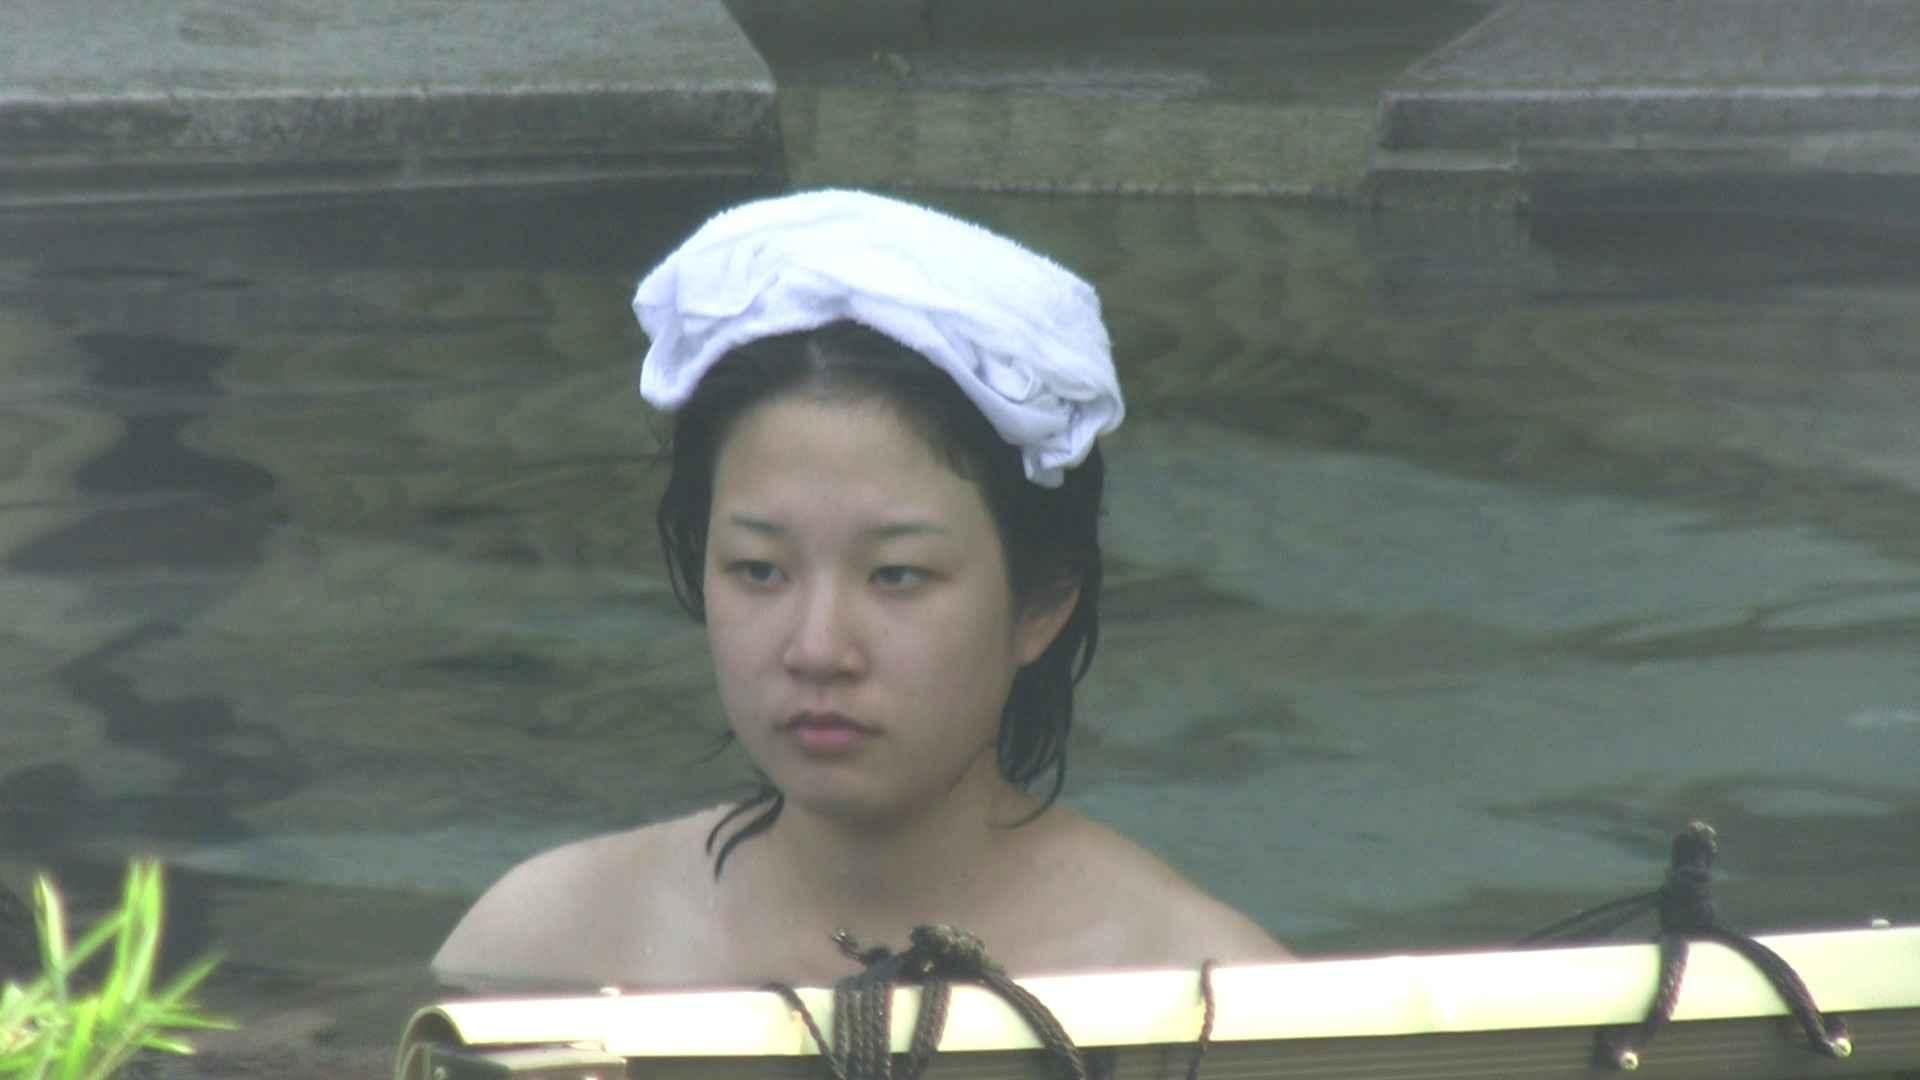 Aquaな露天風呂Vol.172 盗撮映像  113Pix 45